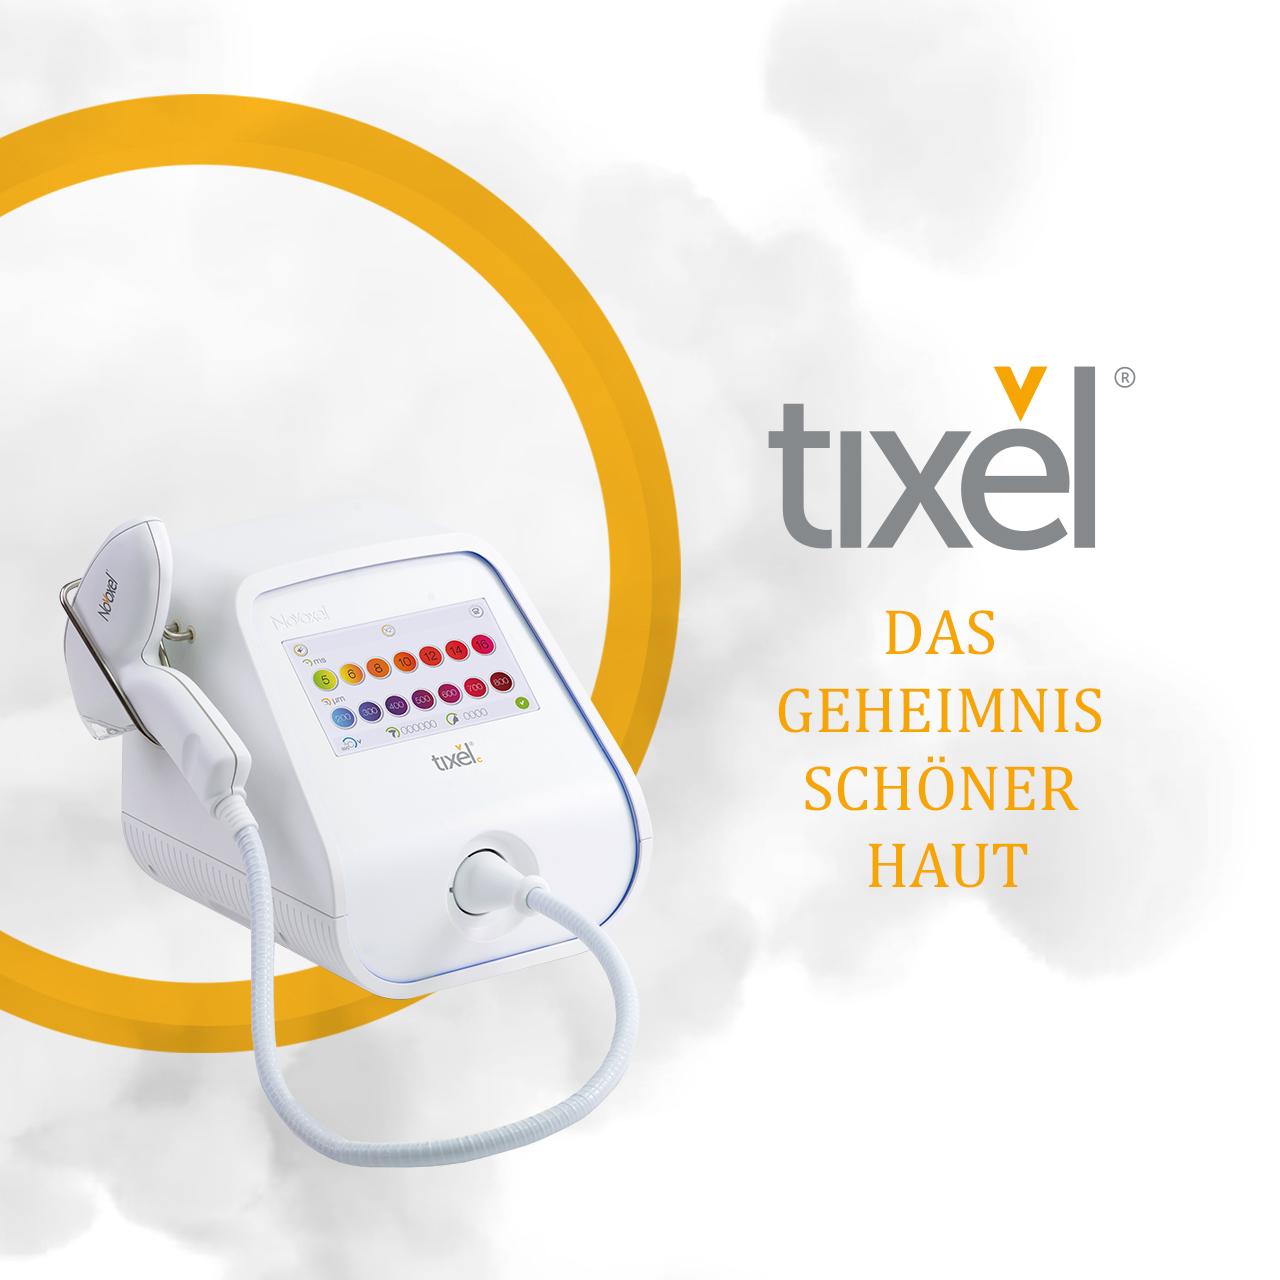 Tixel - Das geheimnis schöner Haut